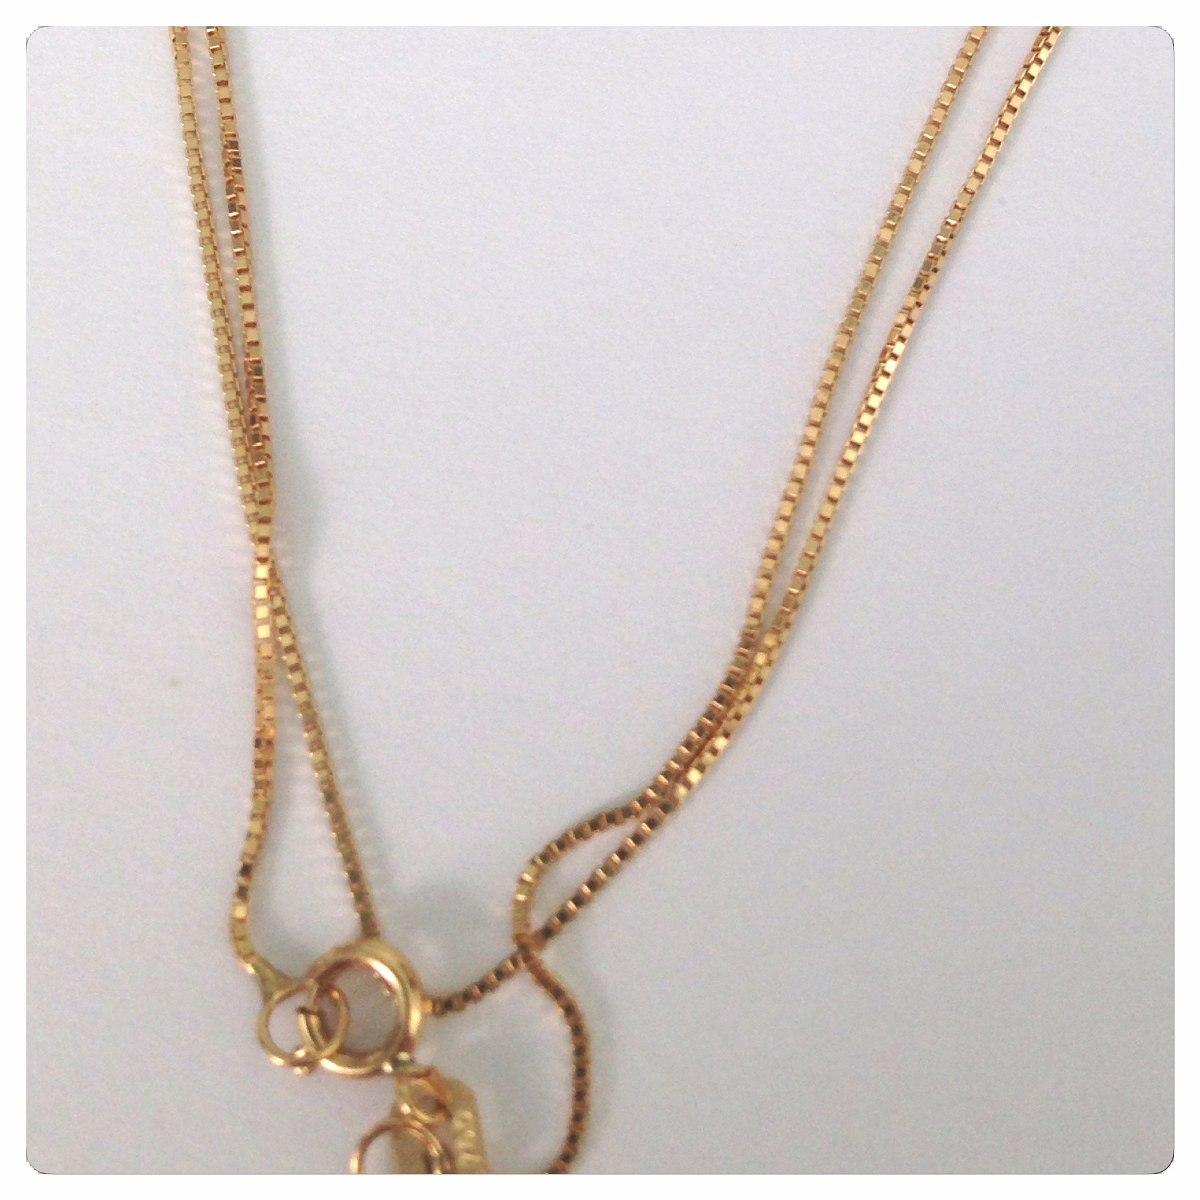 32d0139aa05c6 Corrente de ouro 18k veneziana 1mm com 70cm t